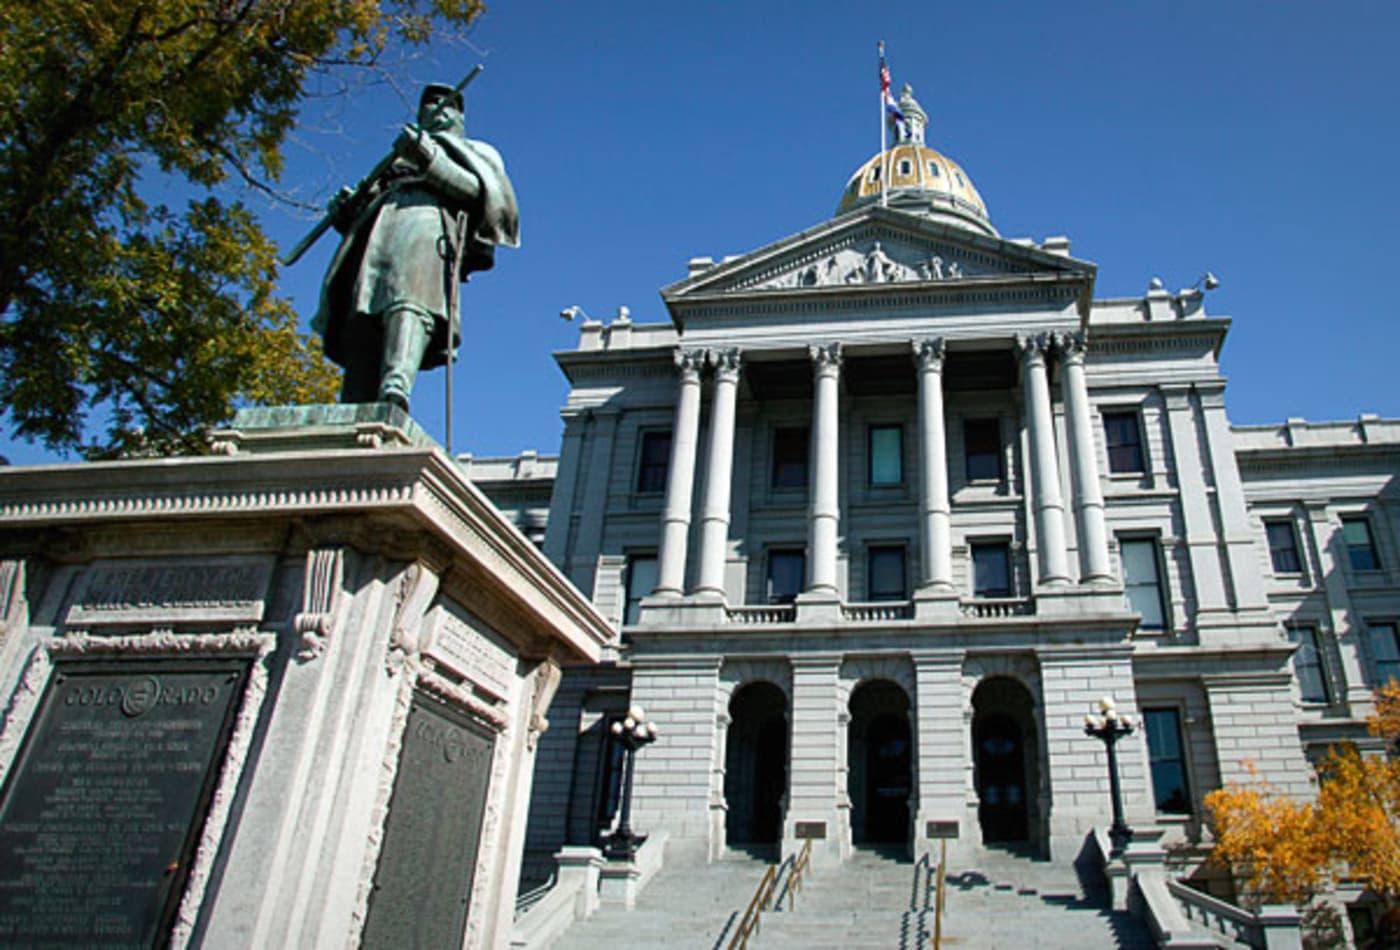 Colorado-American-Tax-Havens-CNBC.jpg